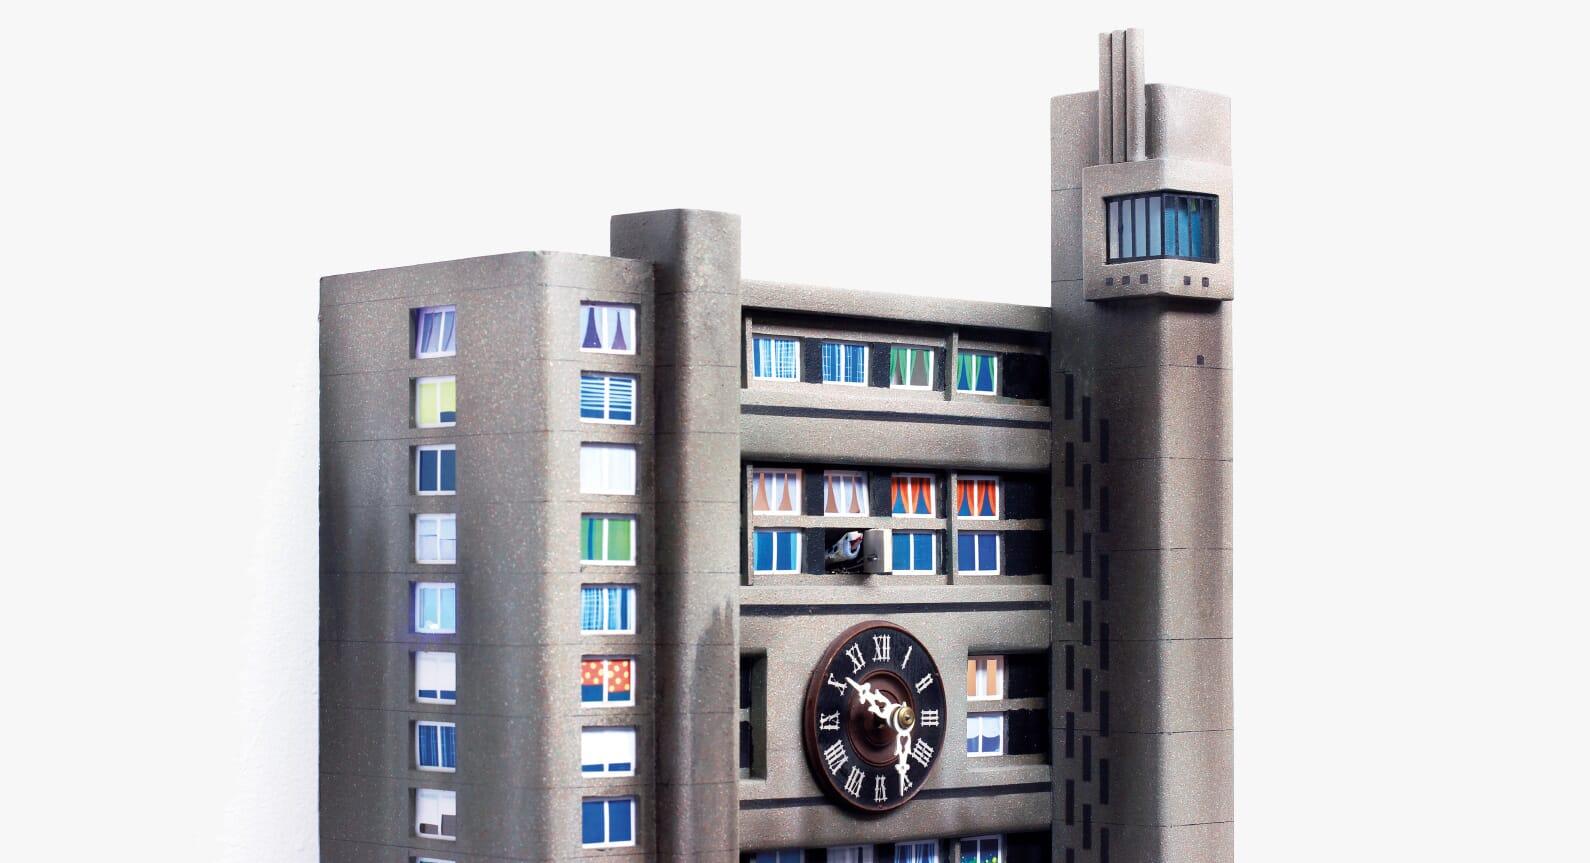 Guido Zimmermann Turns Brutalist Tower Blocks Into Cuckoo Clocks